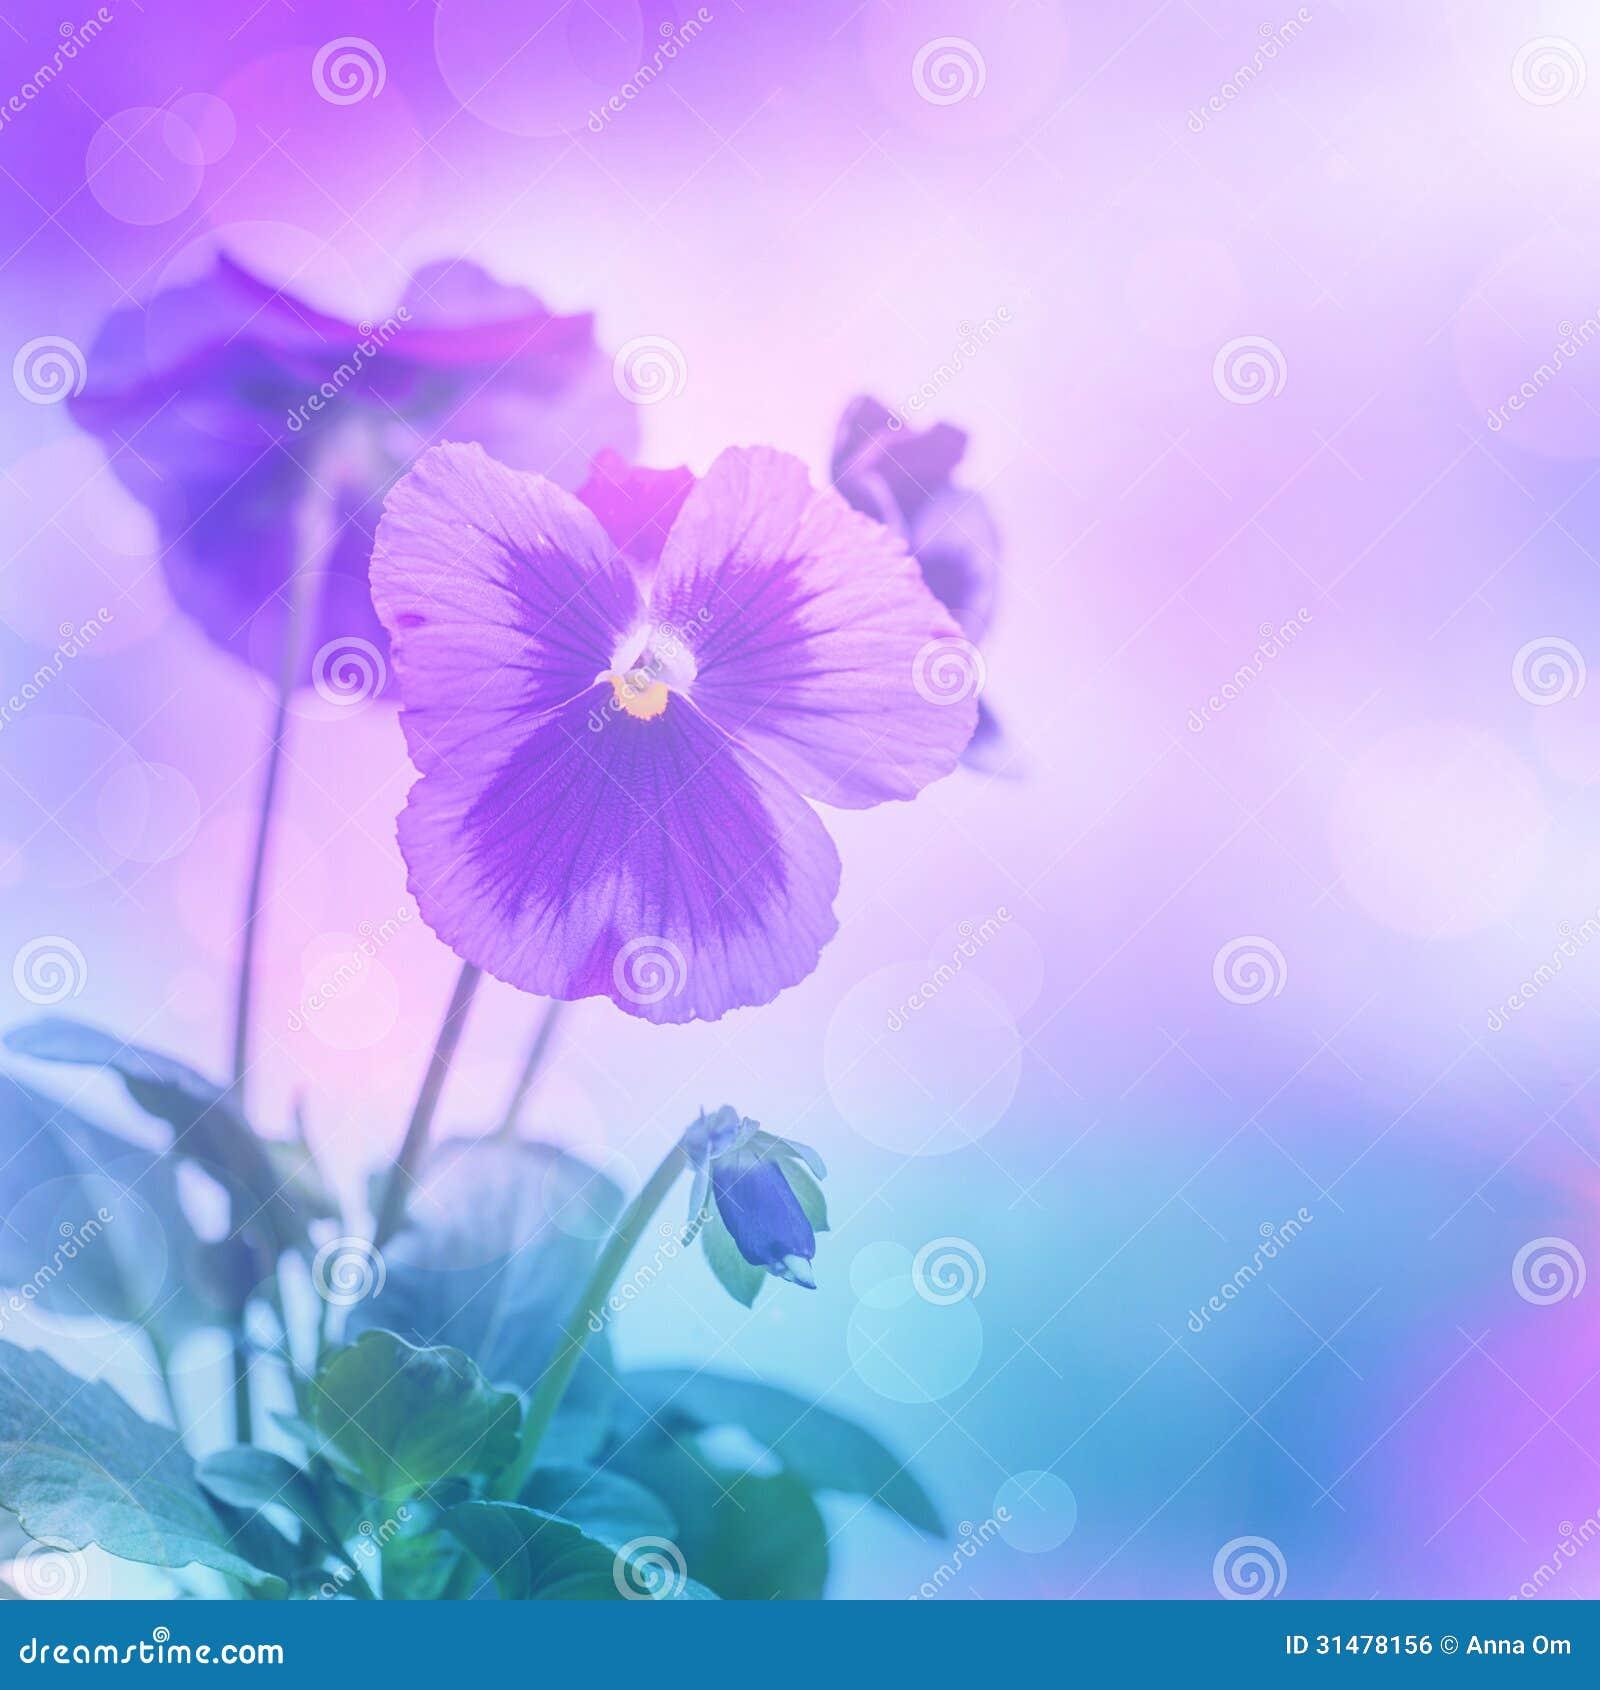 Purple pansies flowers stock photo. Image of lilac, flowers - 31478156